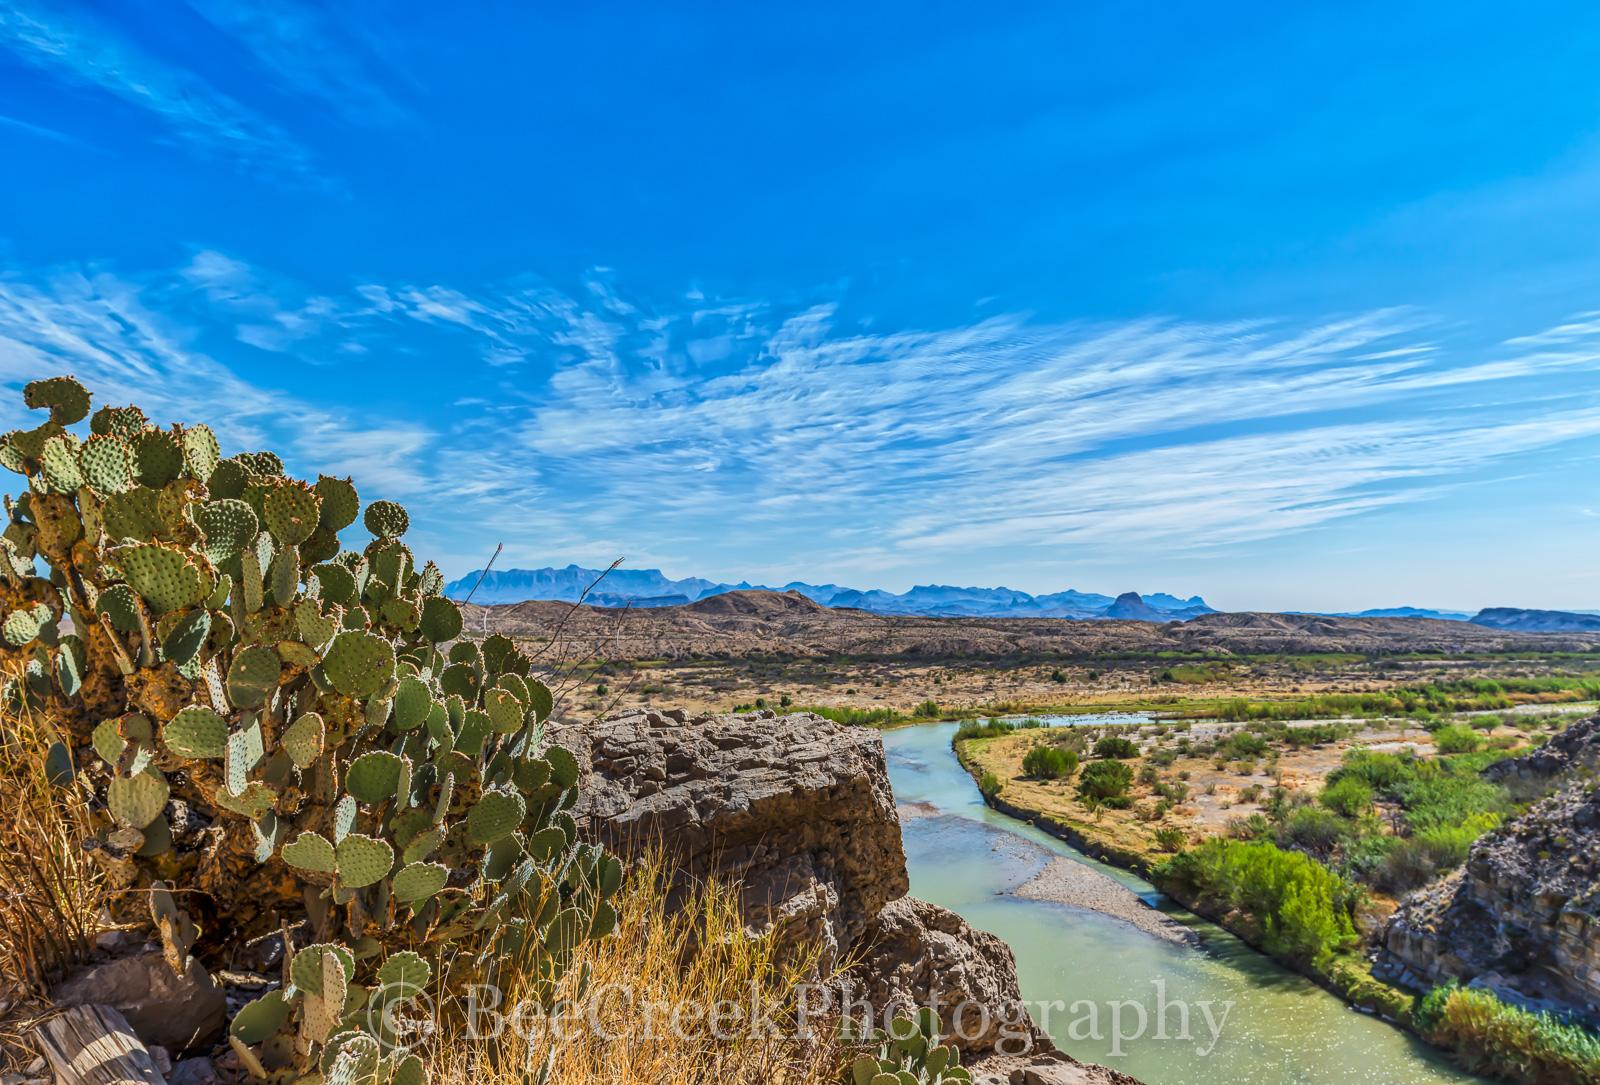 Big Bend National Park, Leisure, Rio Grande River, Santa Elena, canyon, destination, landscape, lifestyle, texas, tourism, travel, vacation, view, photo